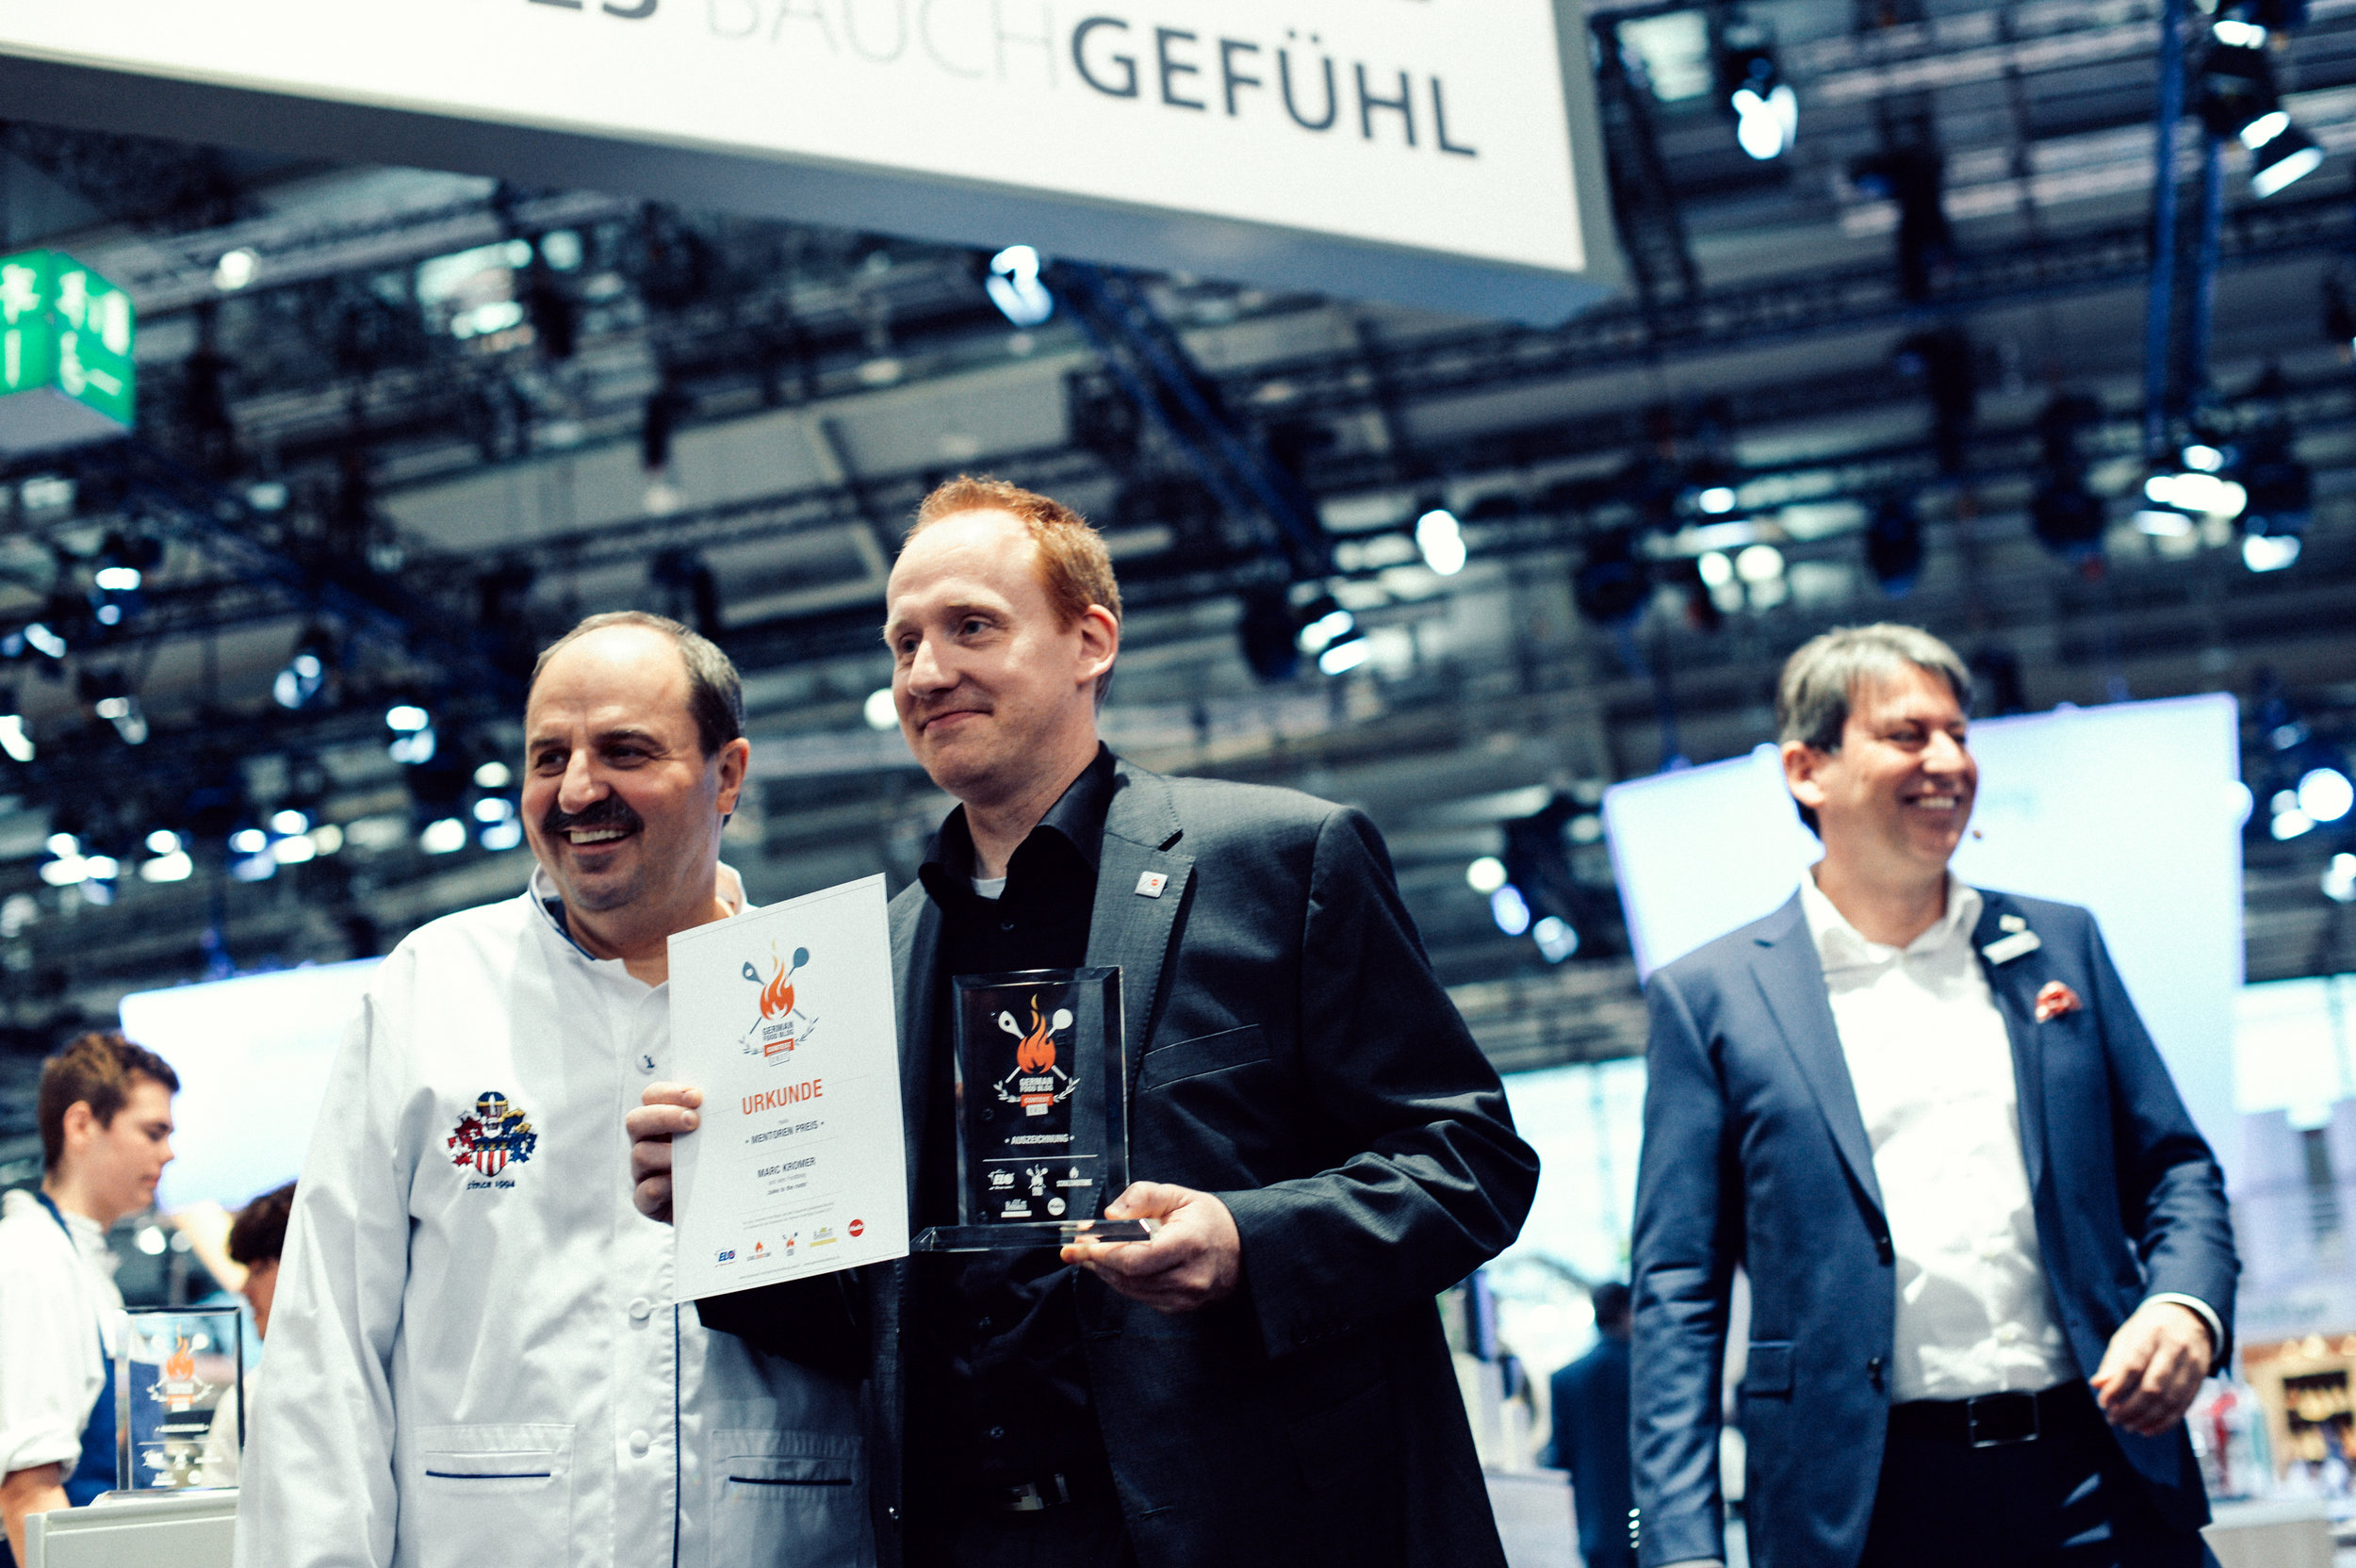 german_food_blog_contest-26.jpg